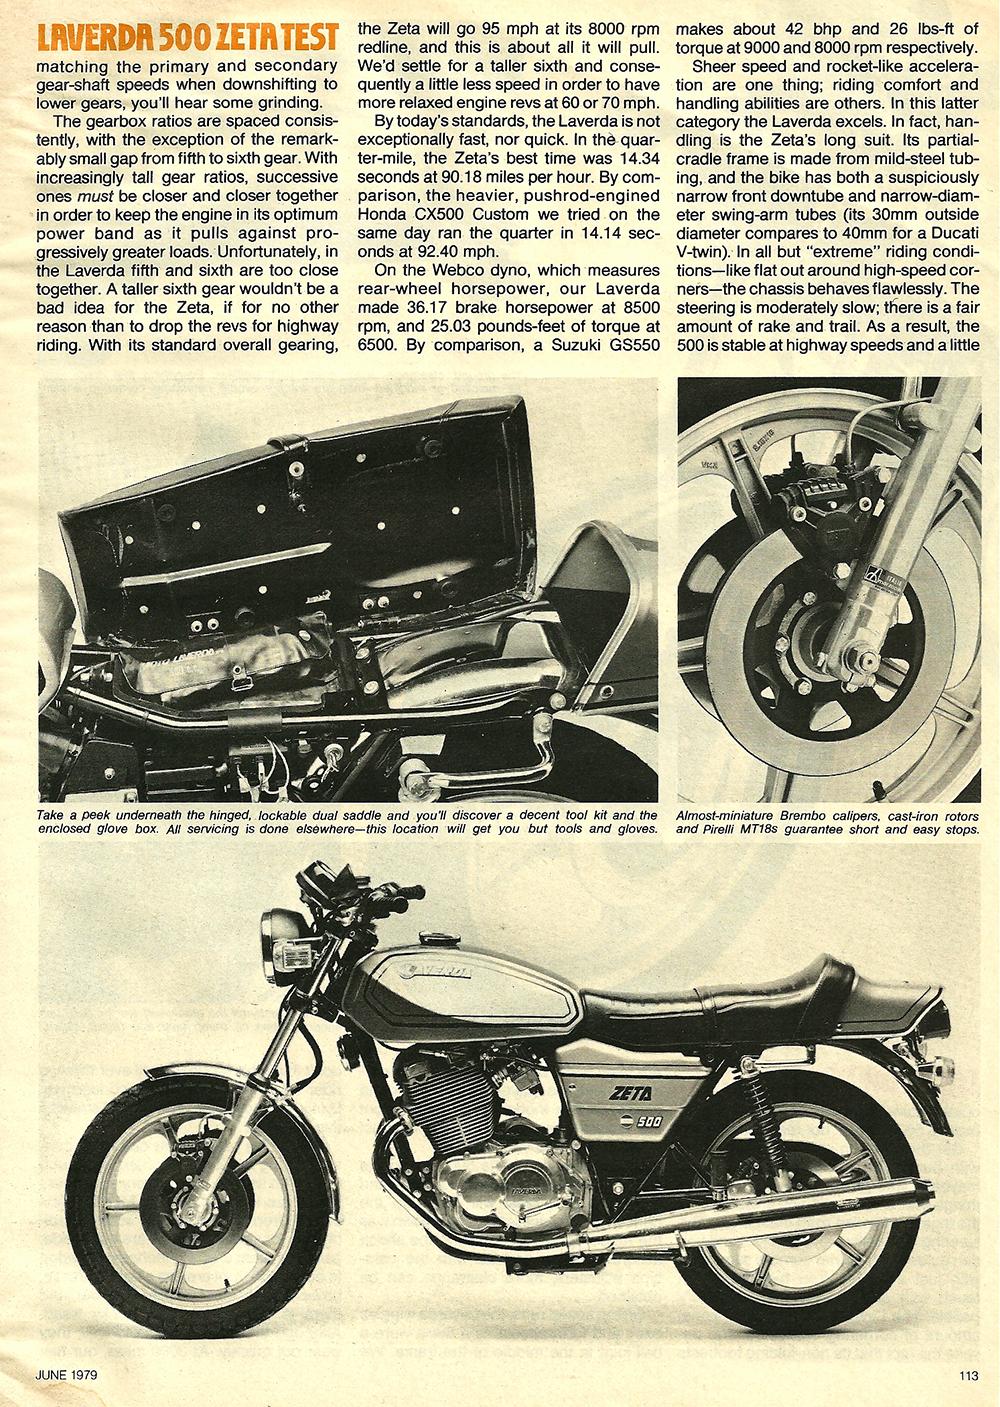 1979 Laverda 500 Zeta road test 4.jpg